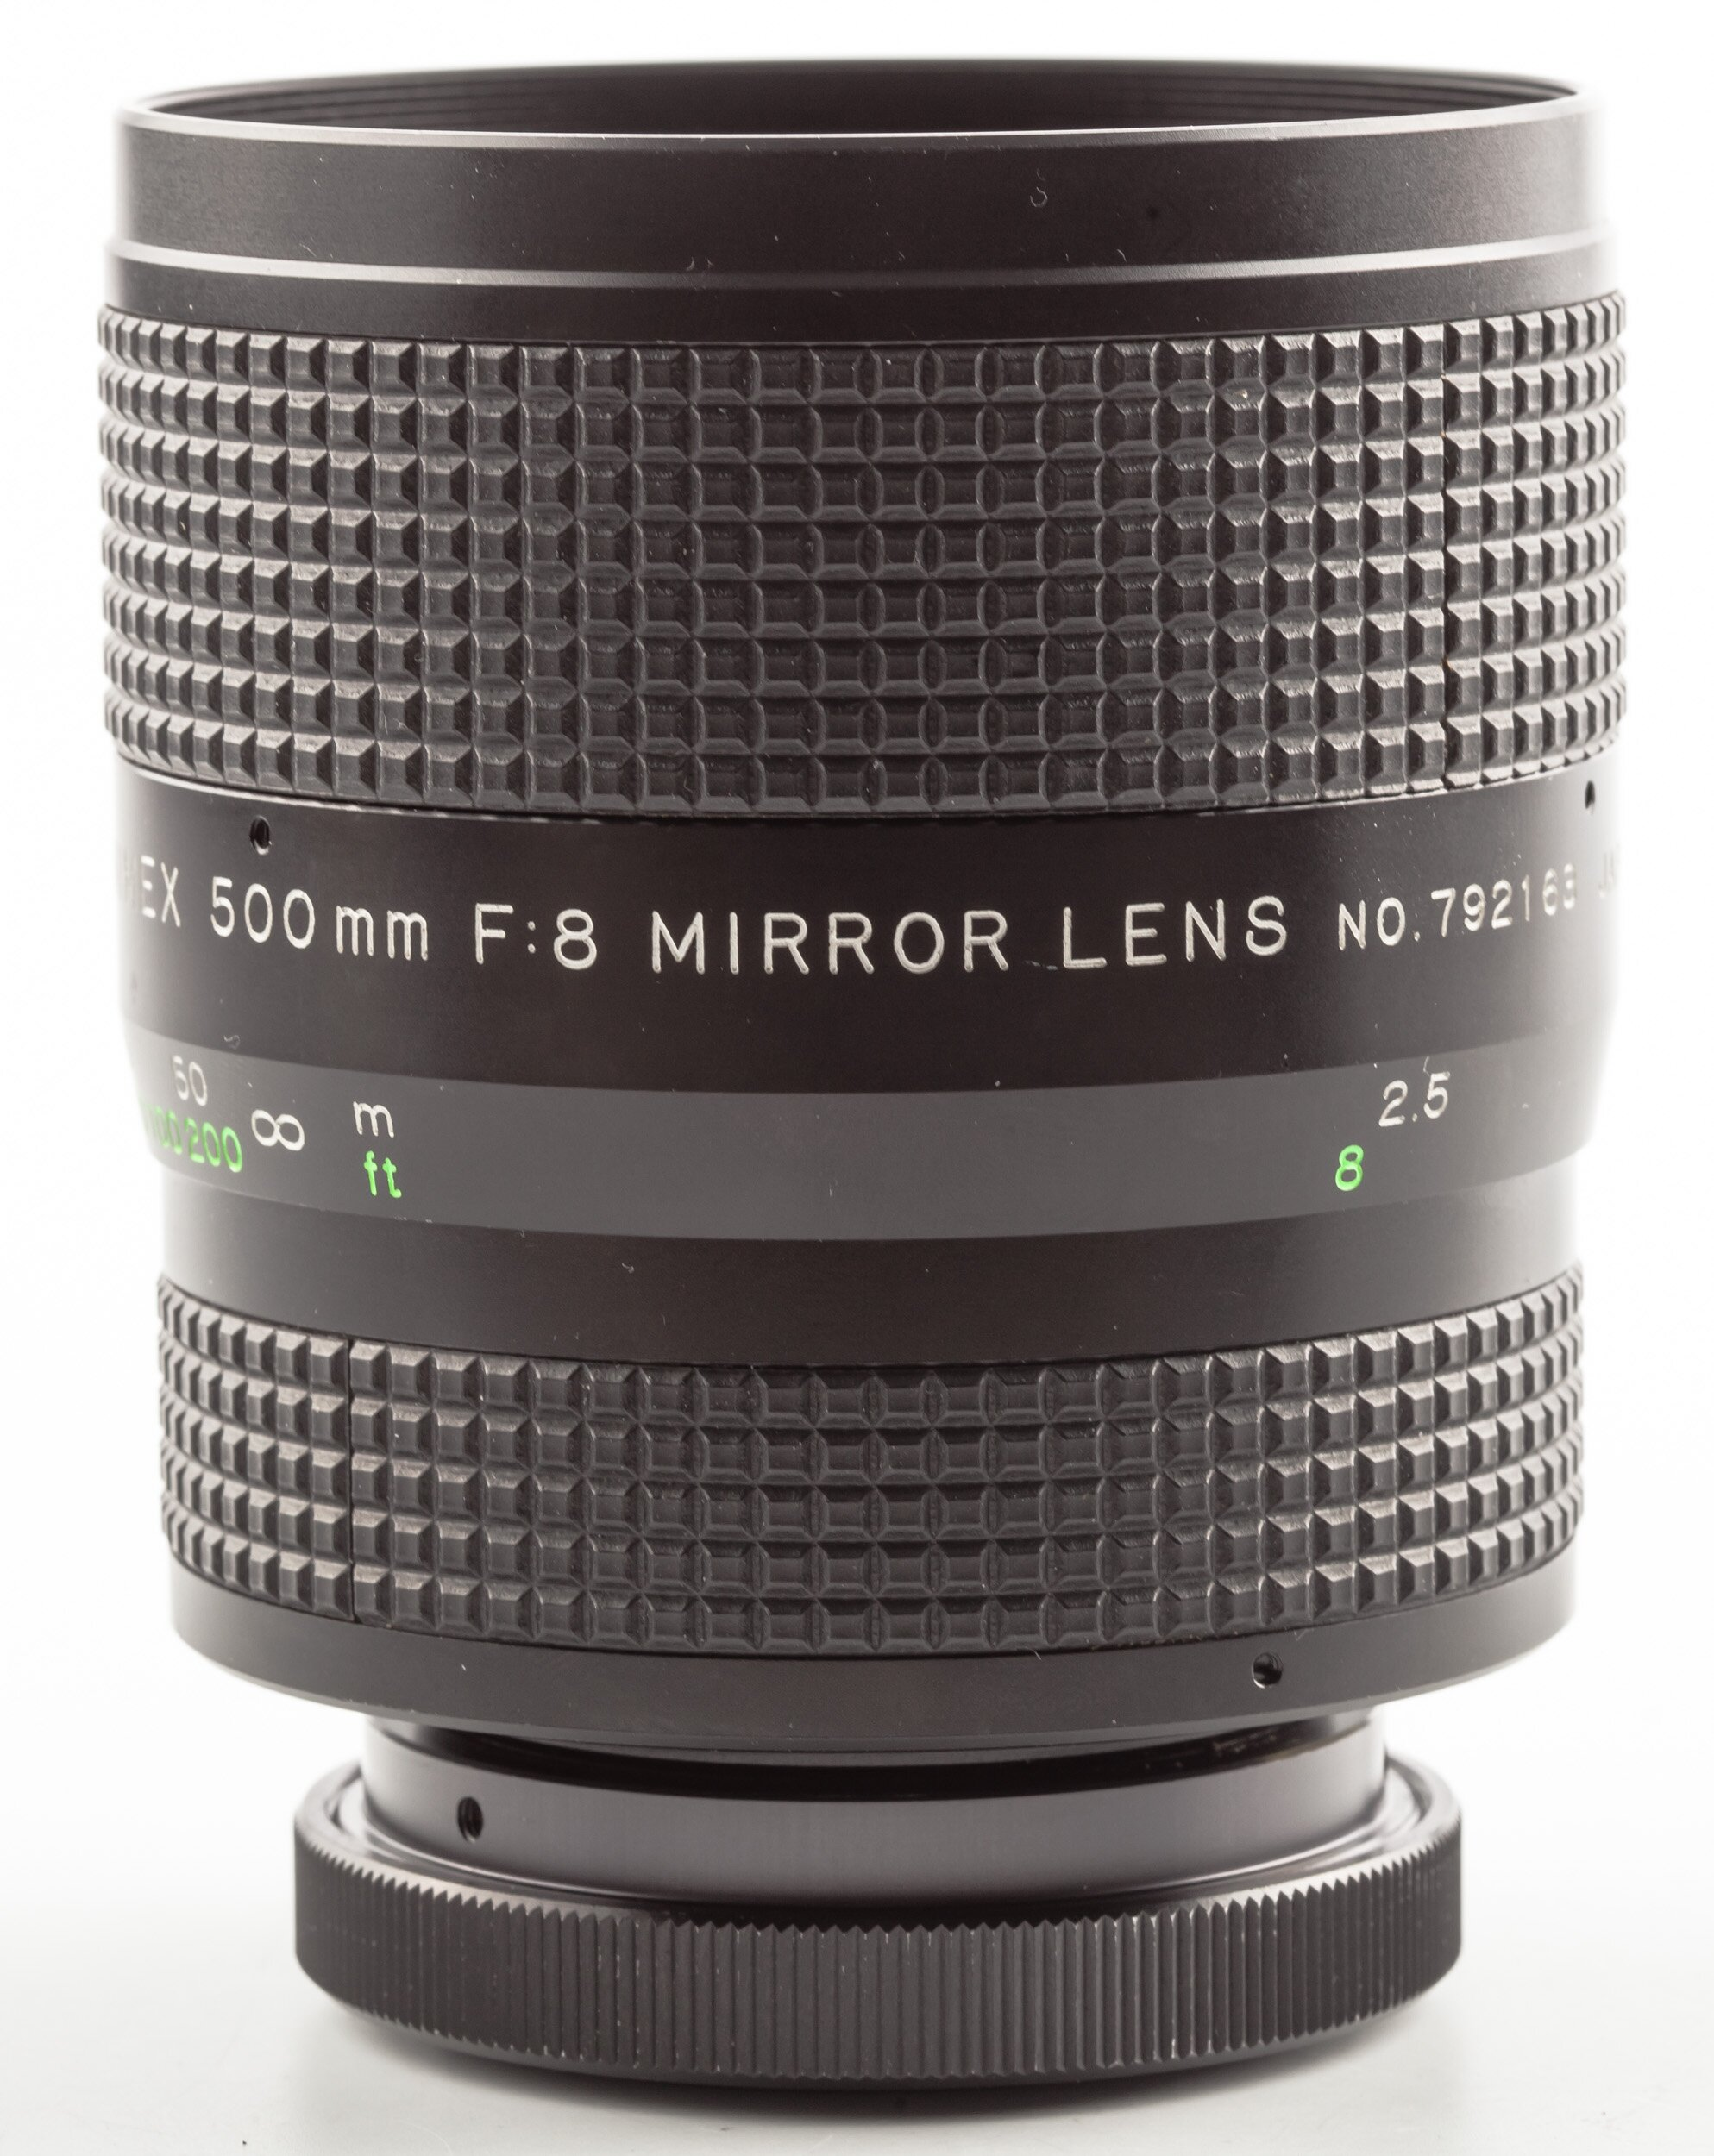 Hanimex 500mm 8 Mirror Lens T2 Canon FD